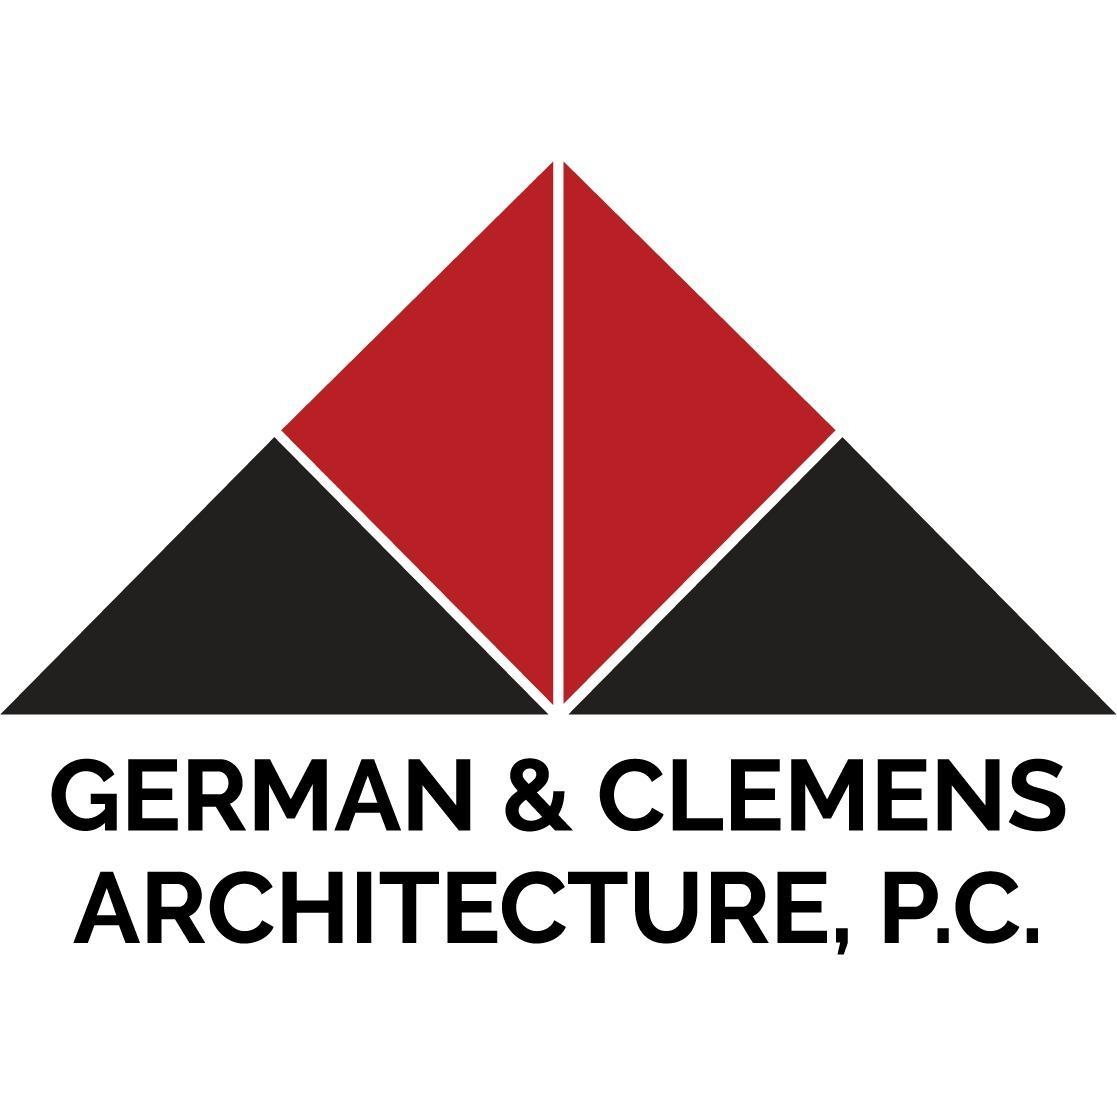 German & Clemens Architecture, PC